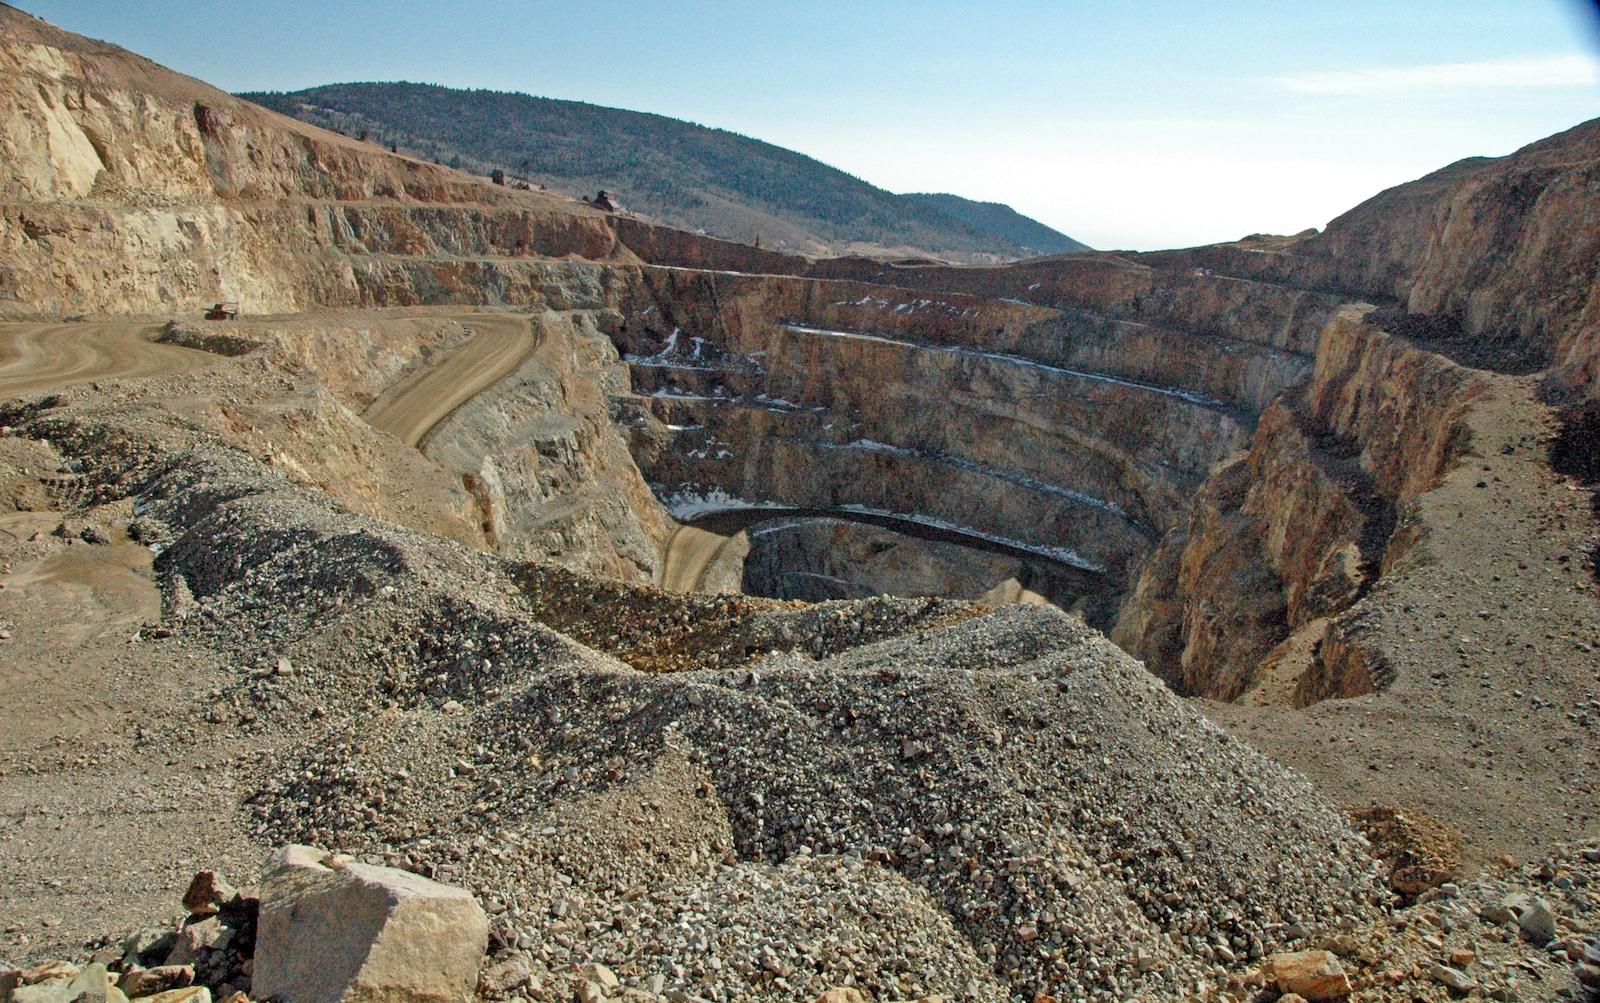 Cripple Creek & Victor Gold Mine, CO